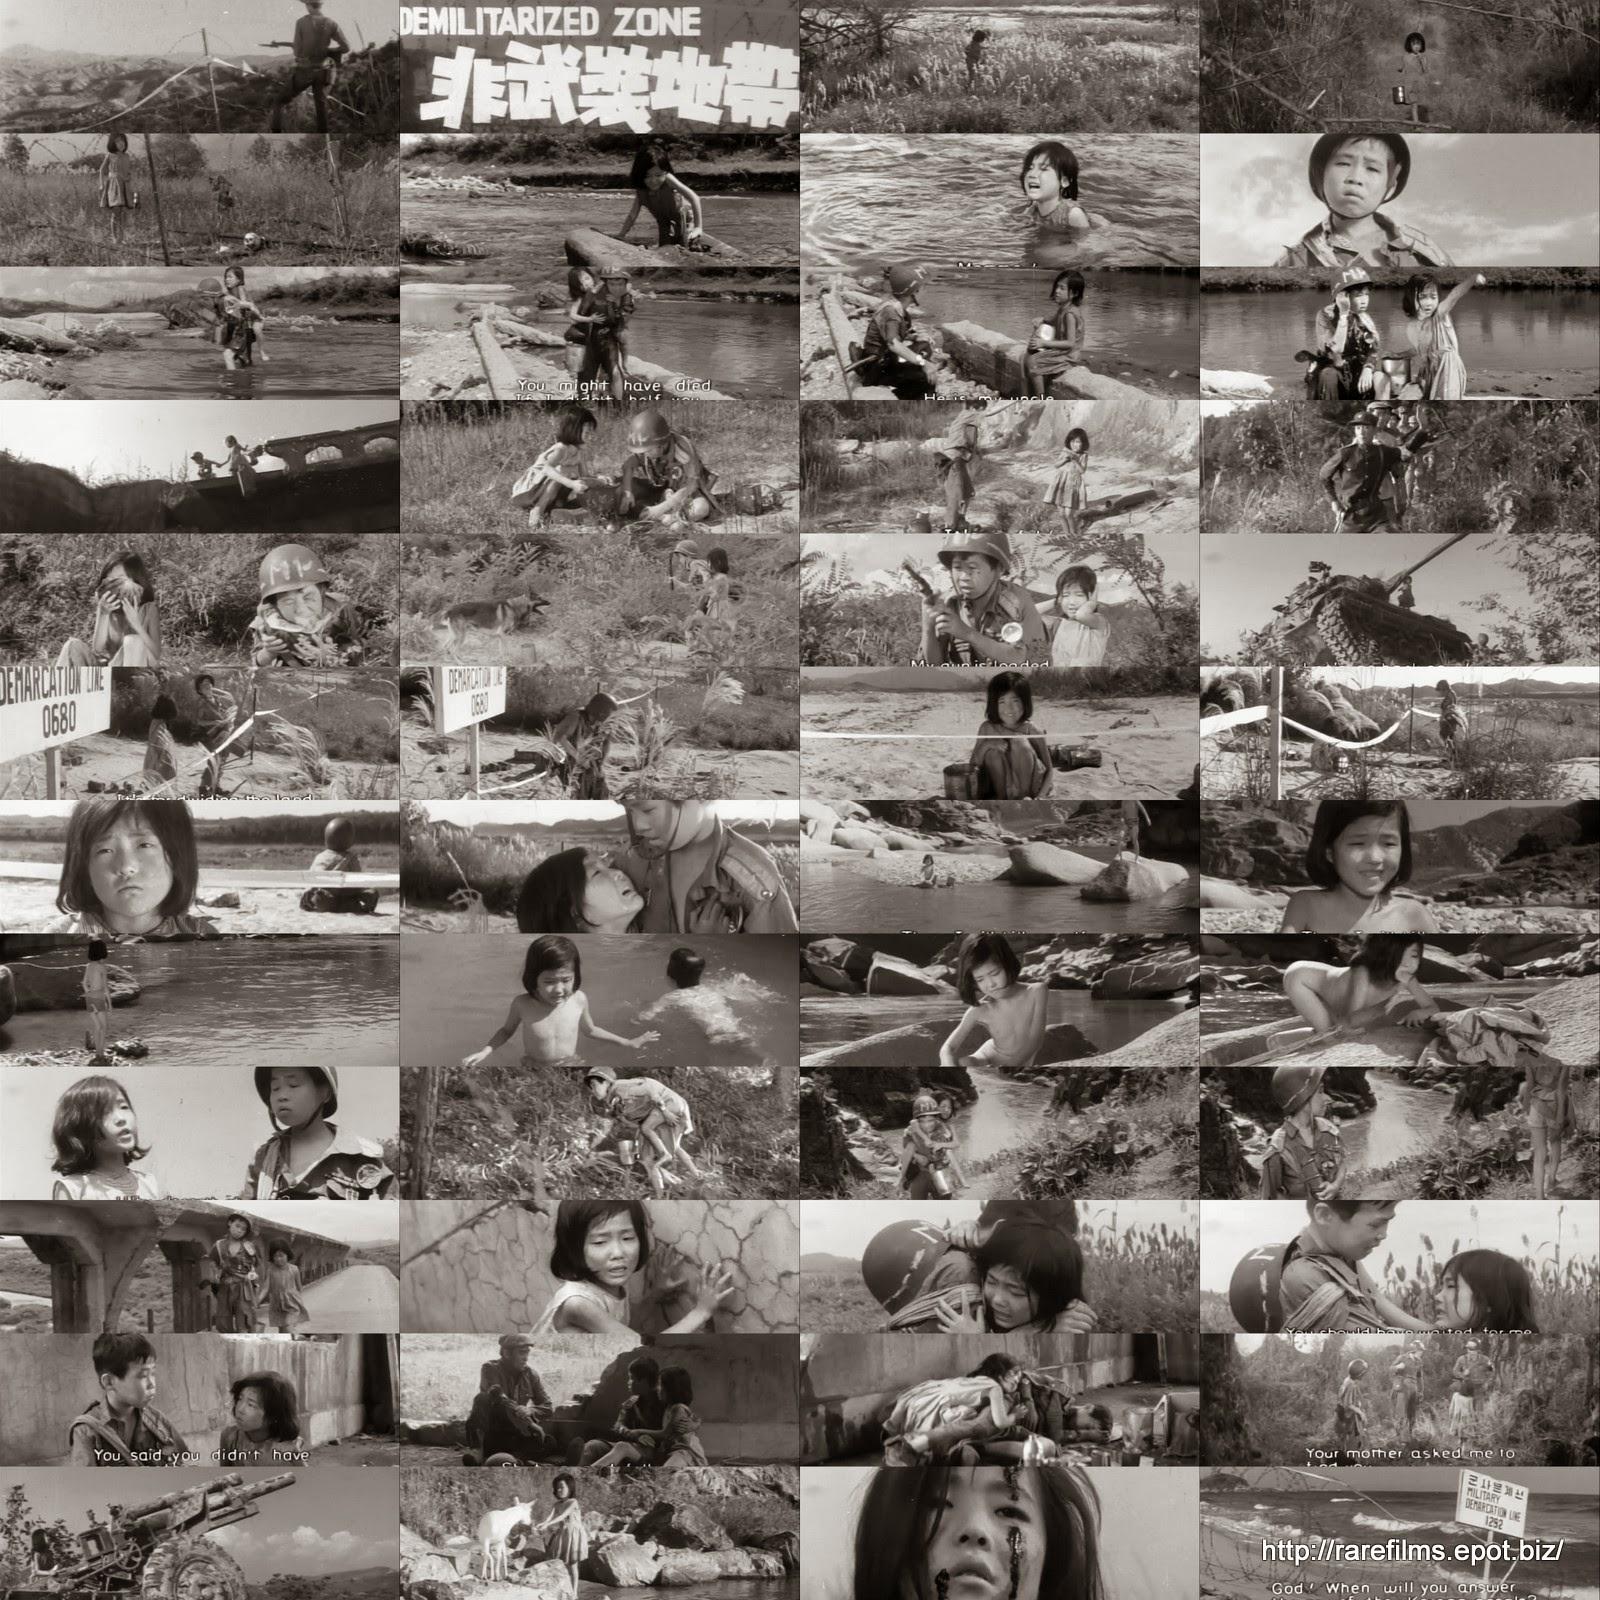 Демилитаризованная зона / Bimujang jidae / The Demilitarized Zone. 1965.